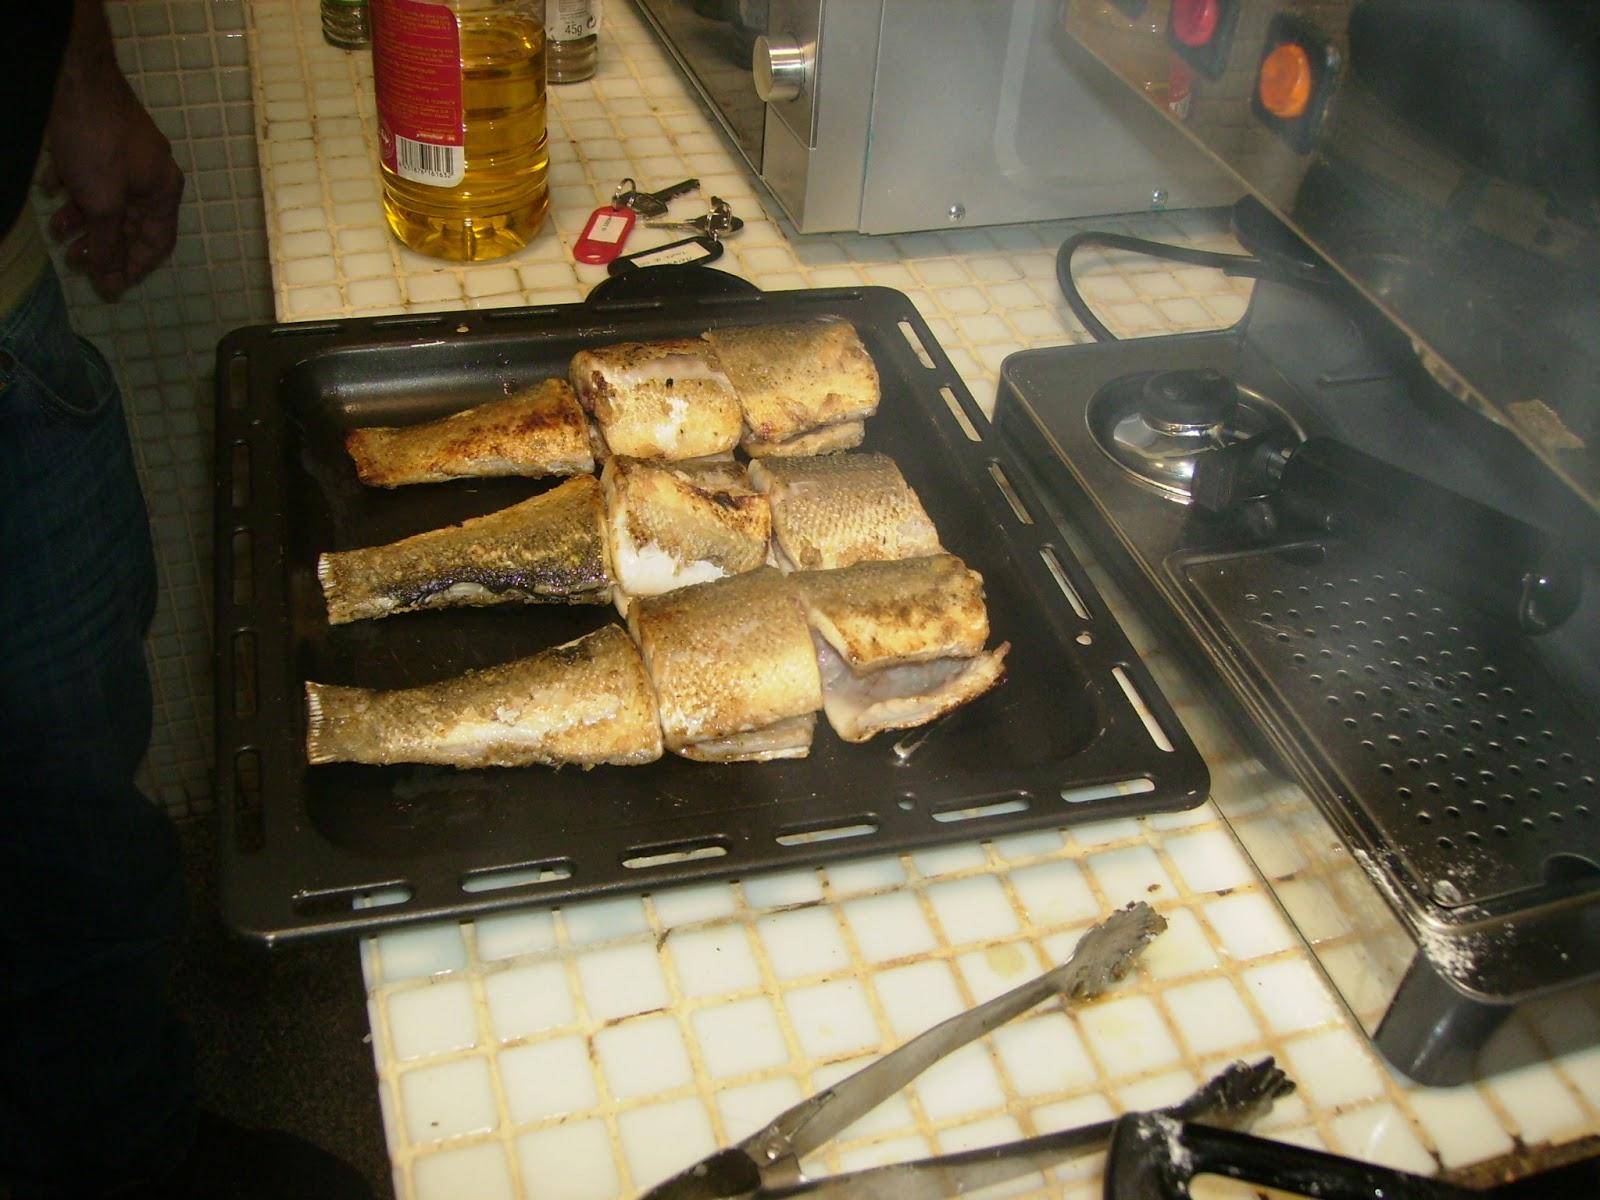 Cocina en tu habitaci n lubina con espinacas a la salsa - Bechamel con nata para cocinar ...